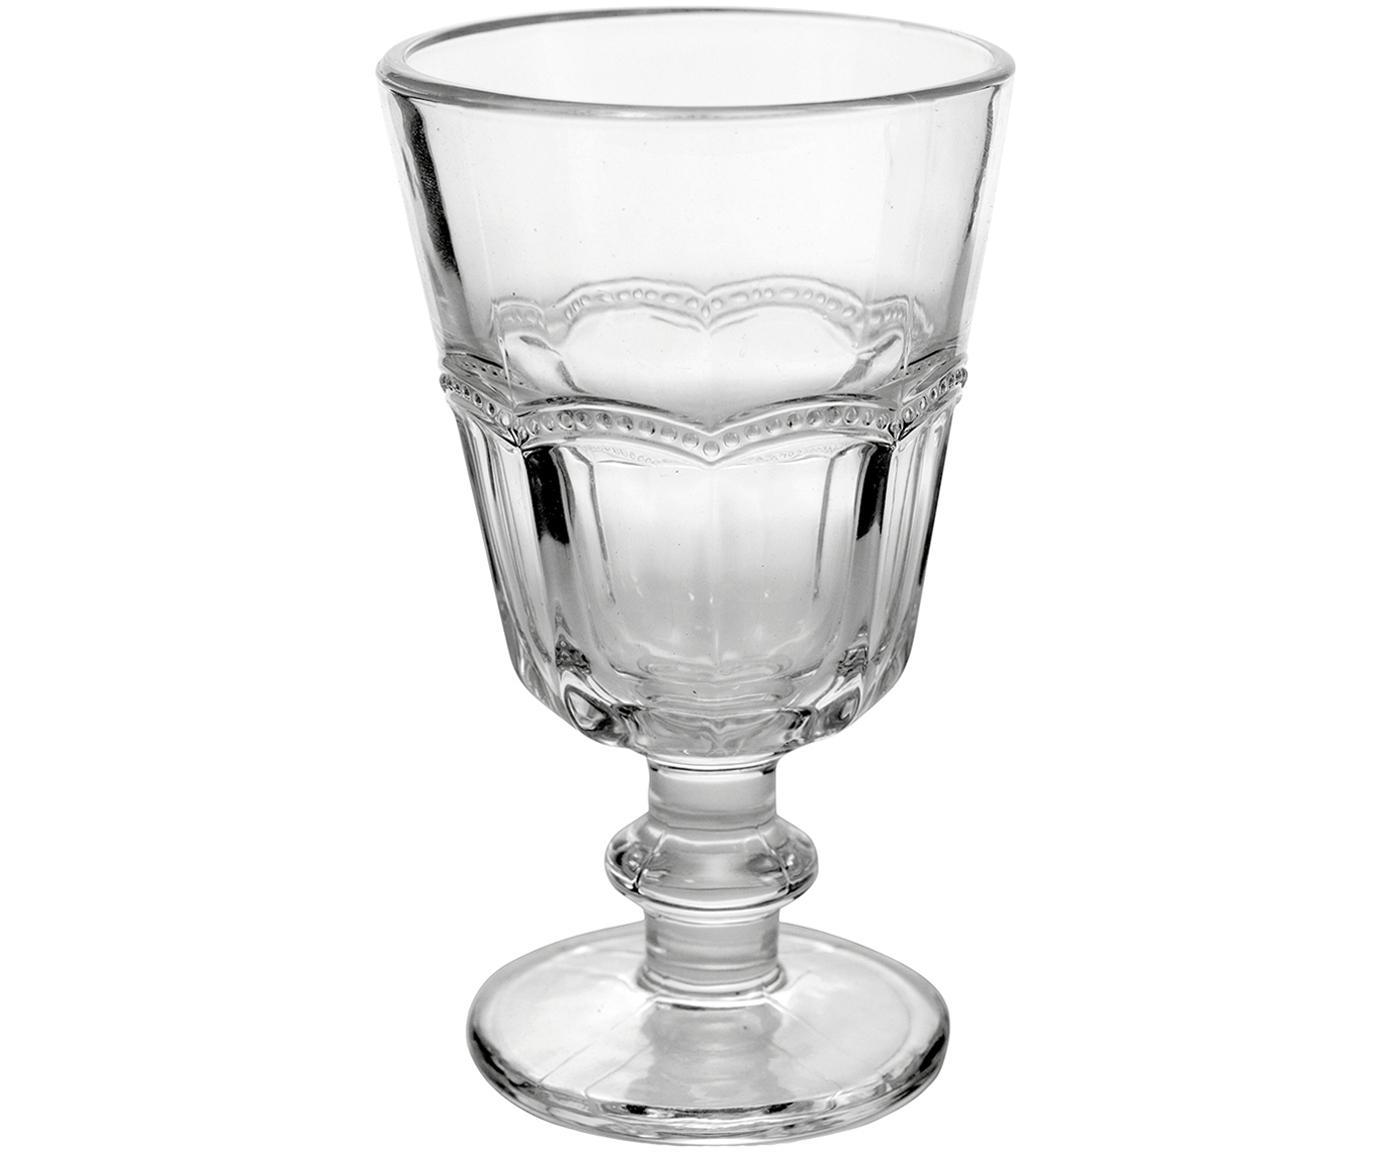 Bicchiere da vino con rilievo Floyd, Vetro, Trasparente, Ø 9 x Alt. 14 cm